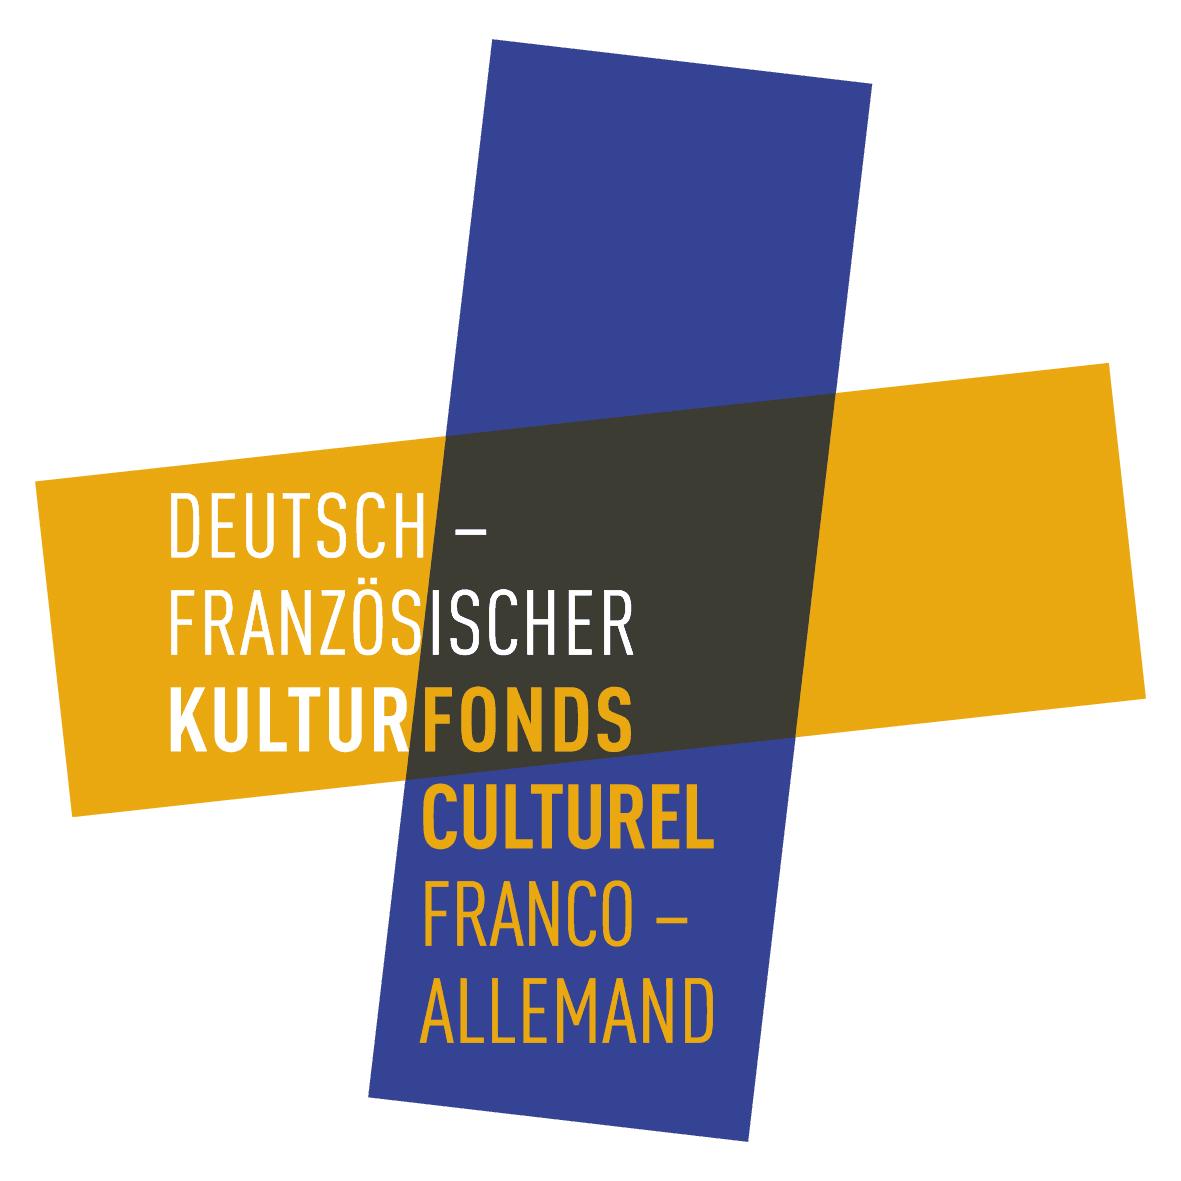 Franco-German Cultural Fund